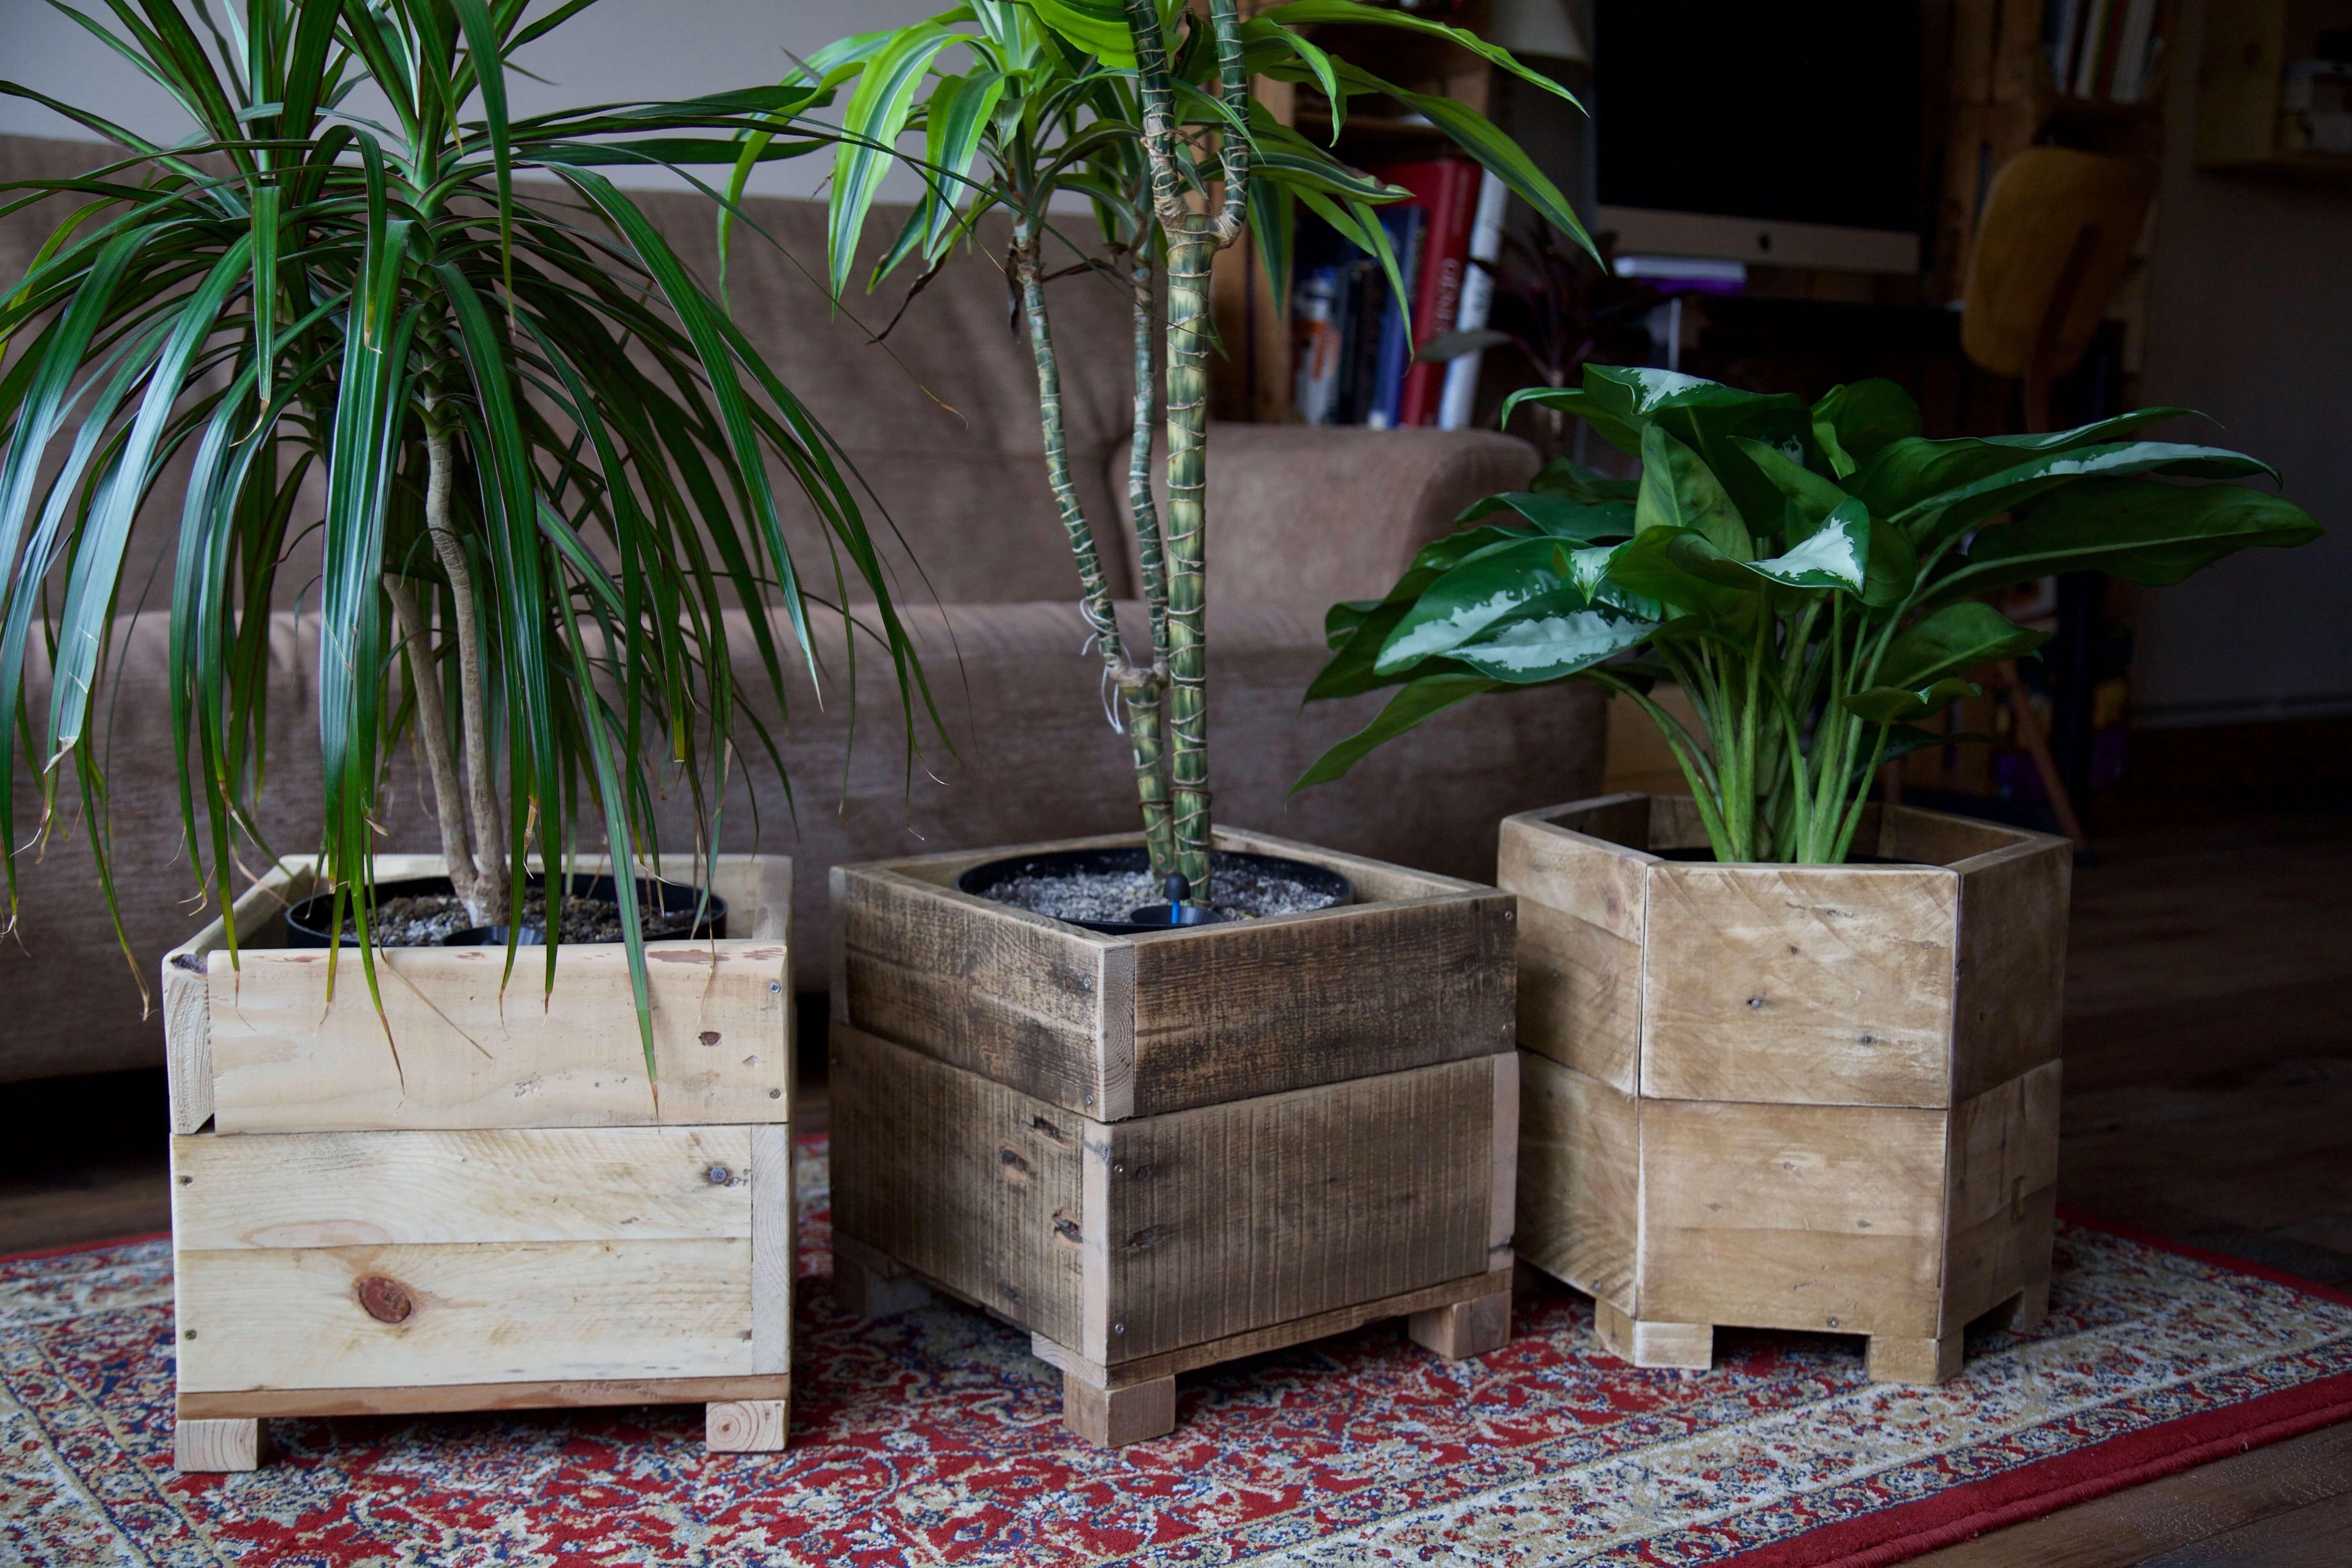 Jardinera xavier paletos - Jardineras de madera caseras ...